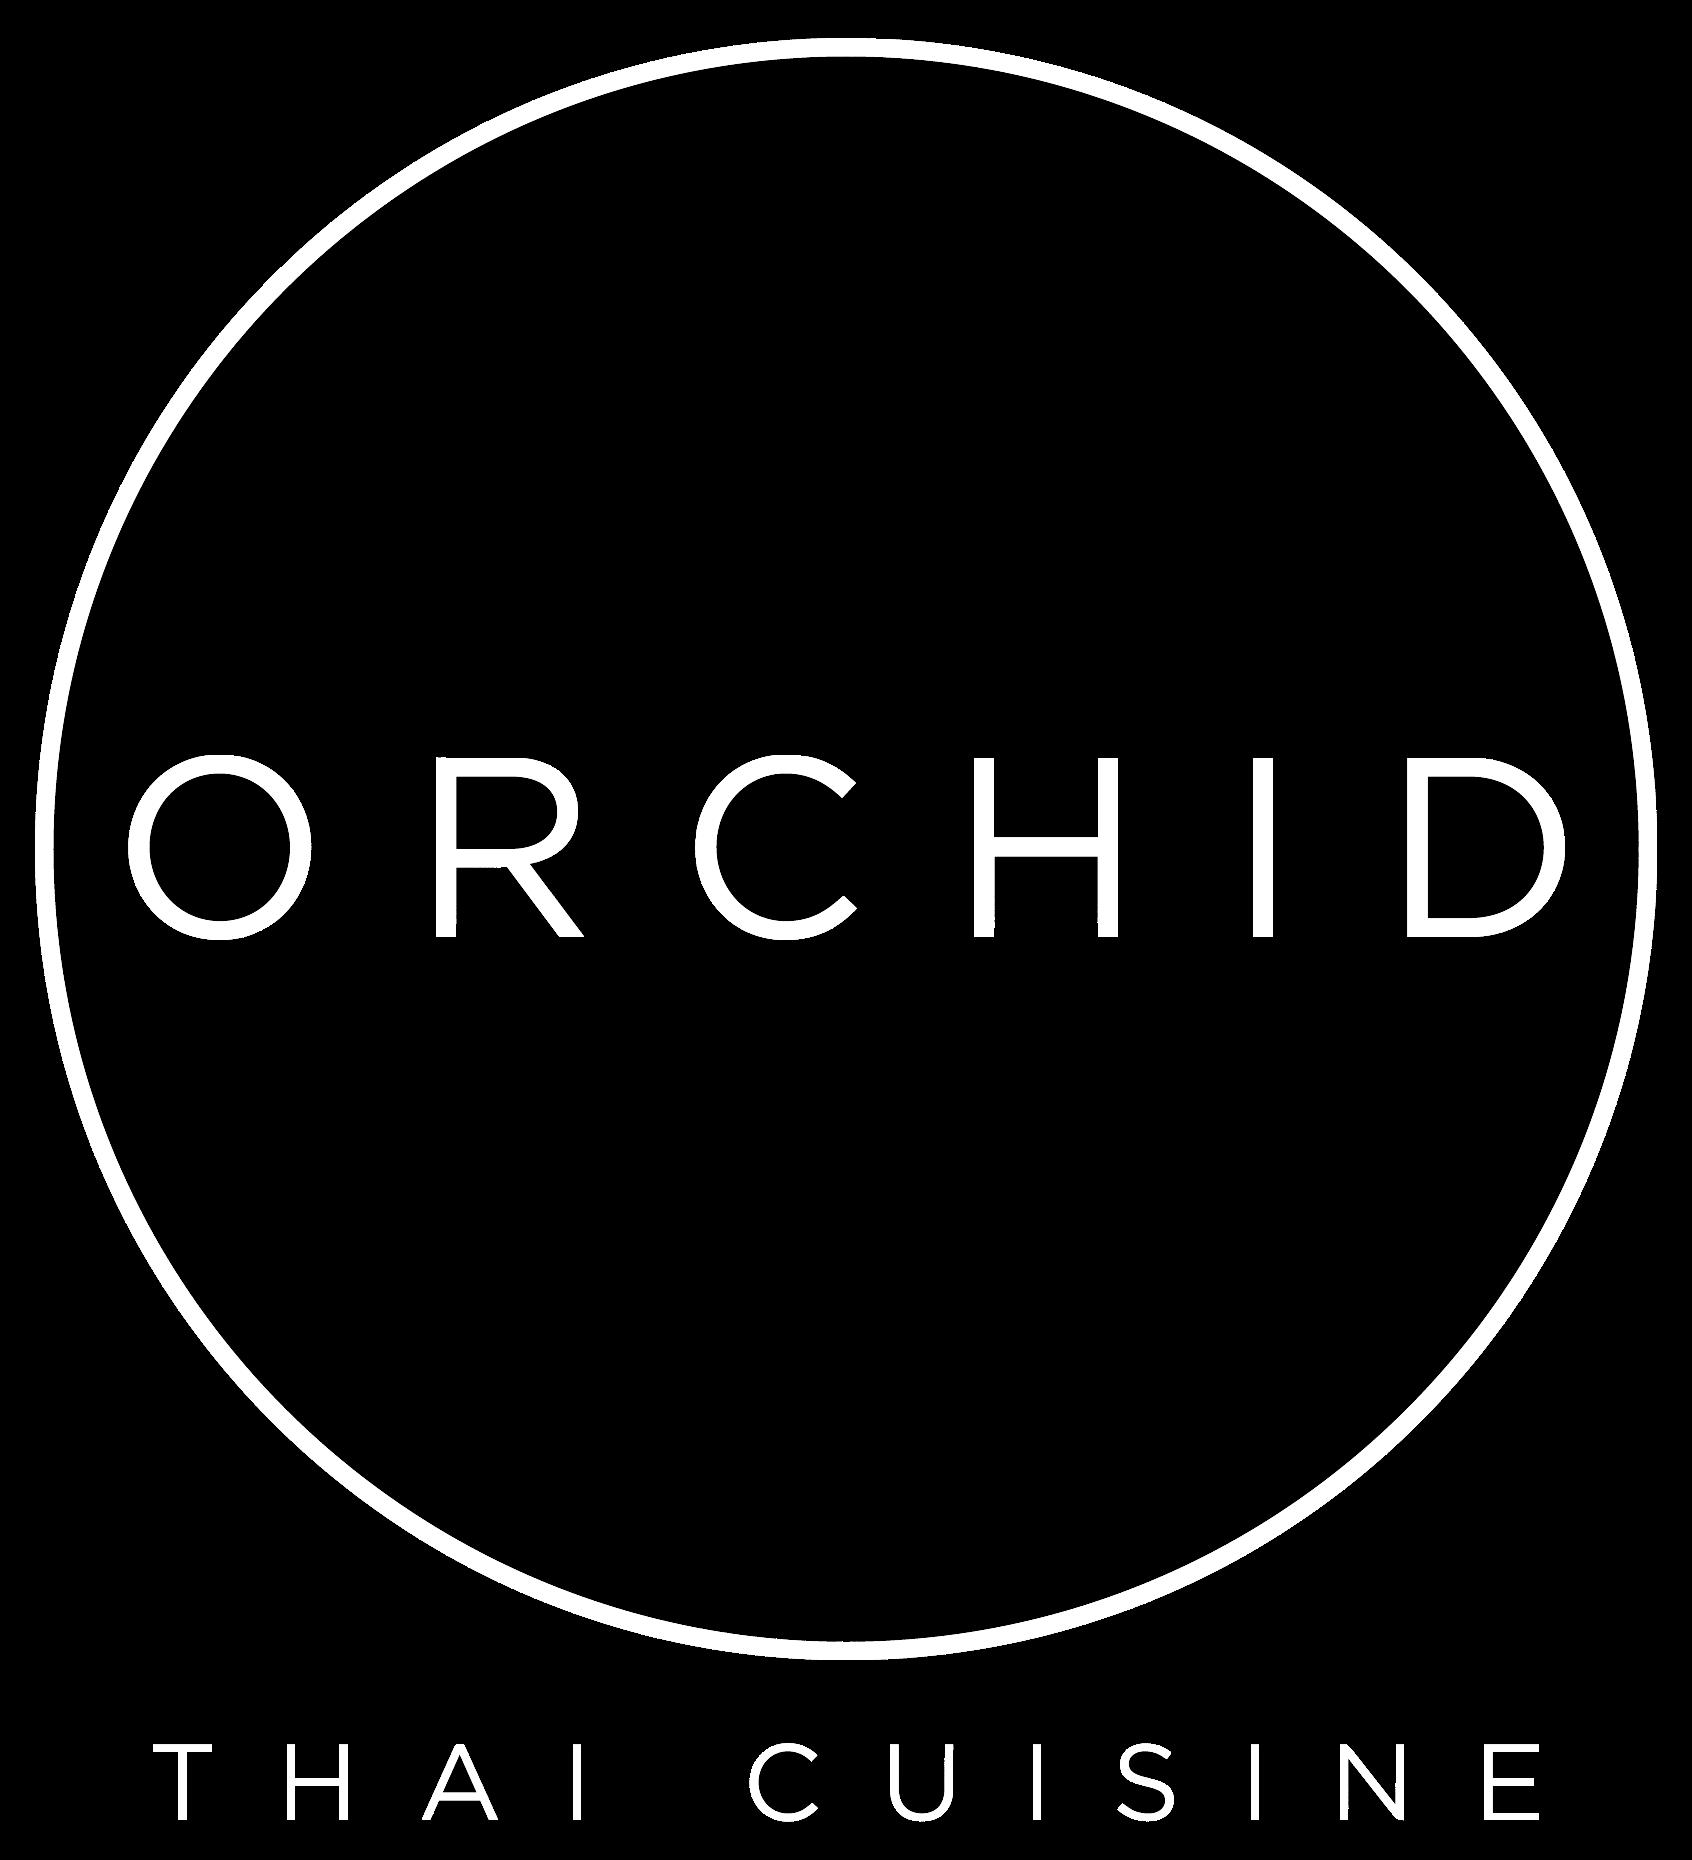 OrchidLogo_ThaiCuisine Transparent white.png